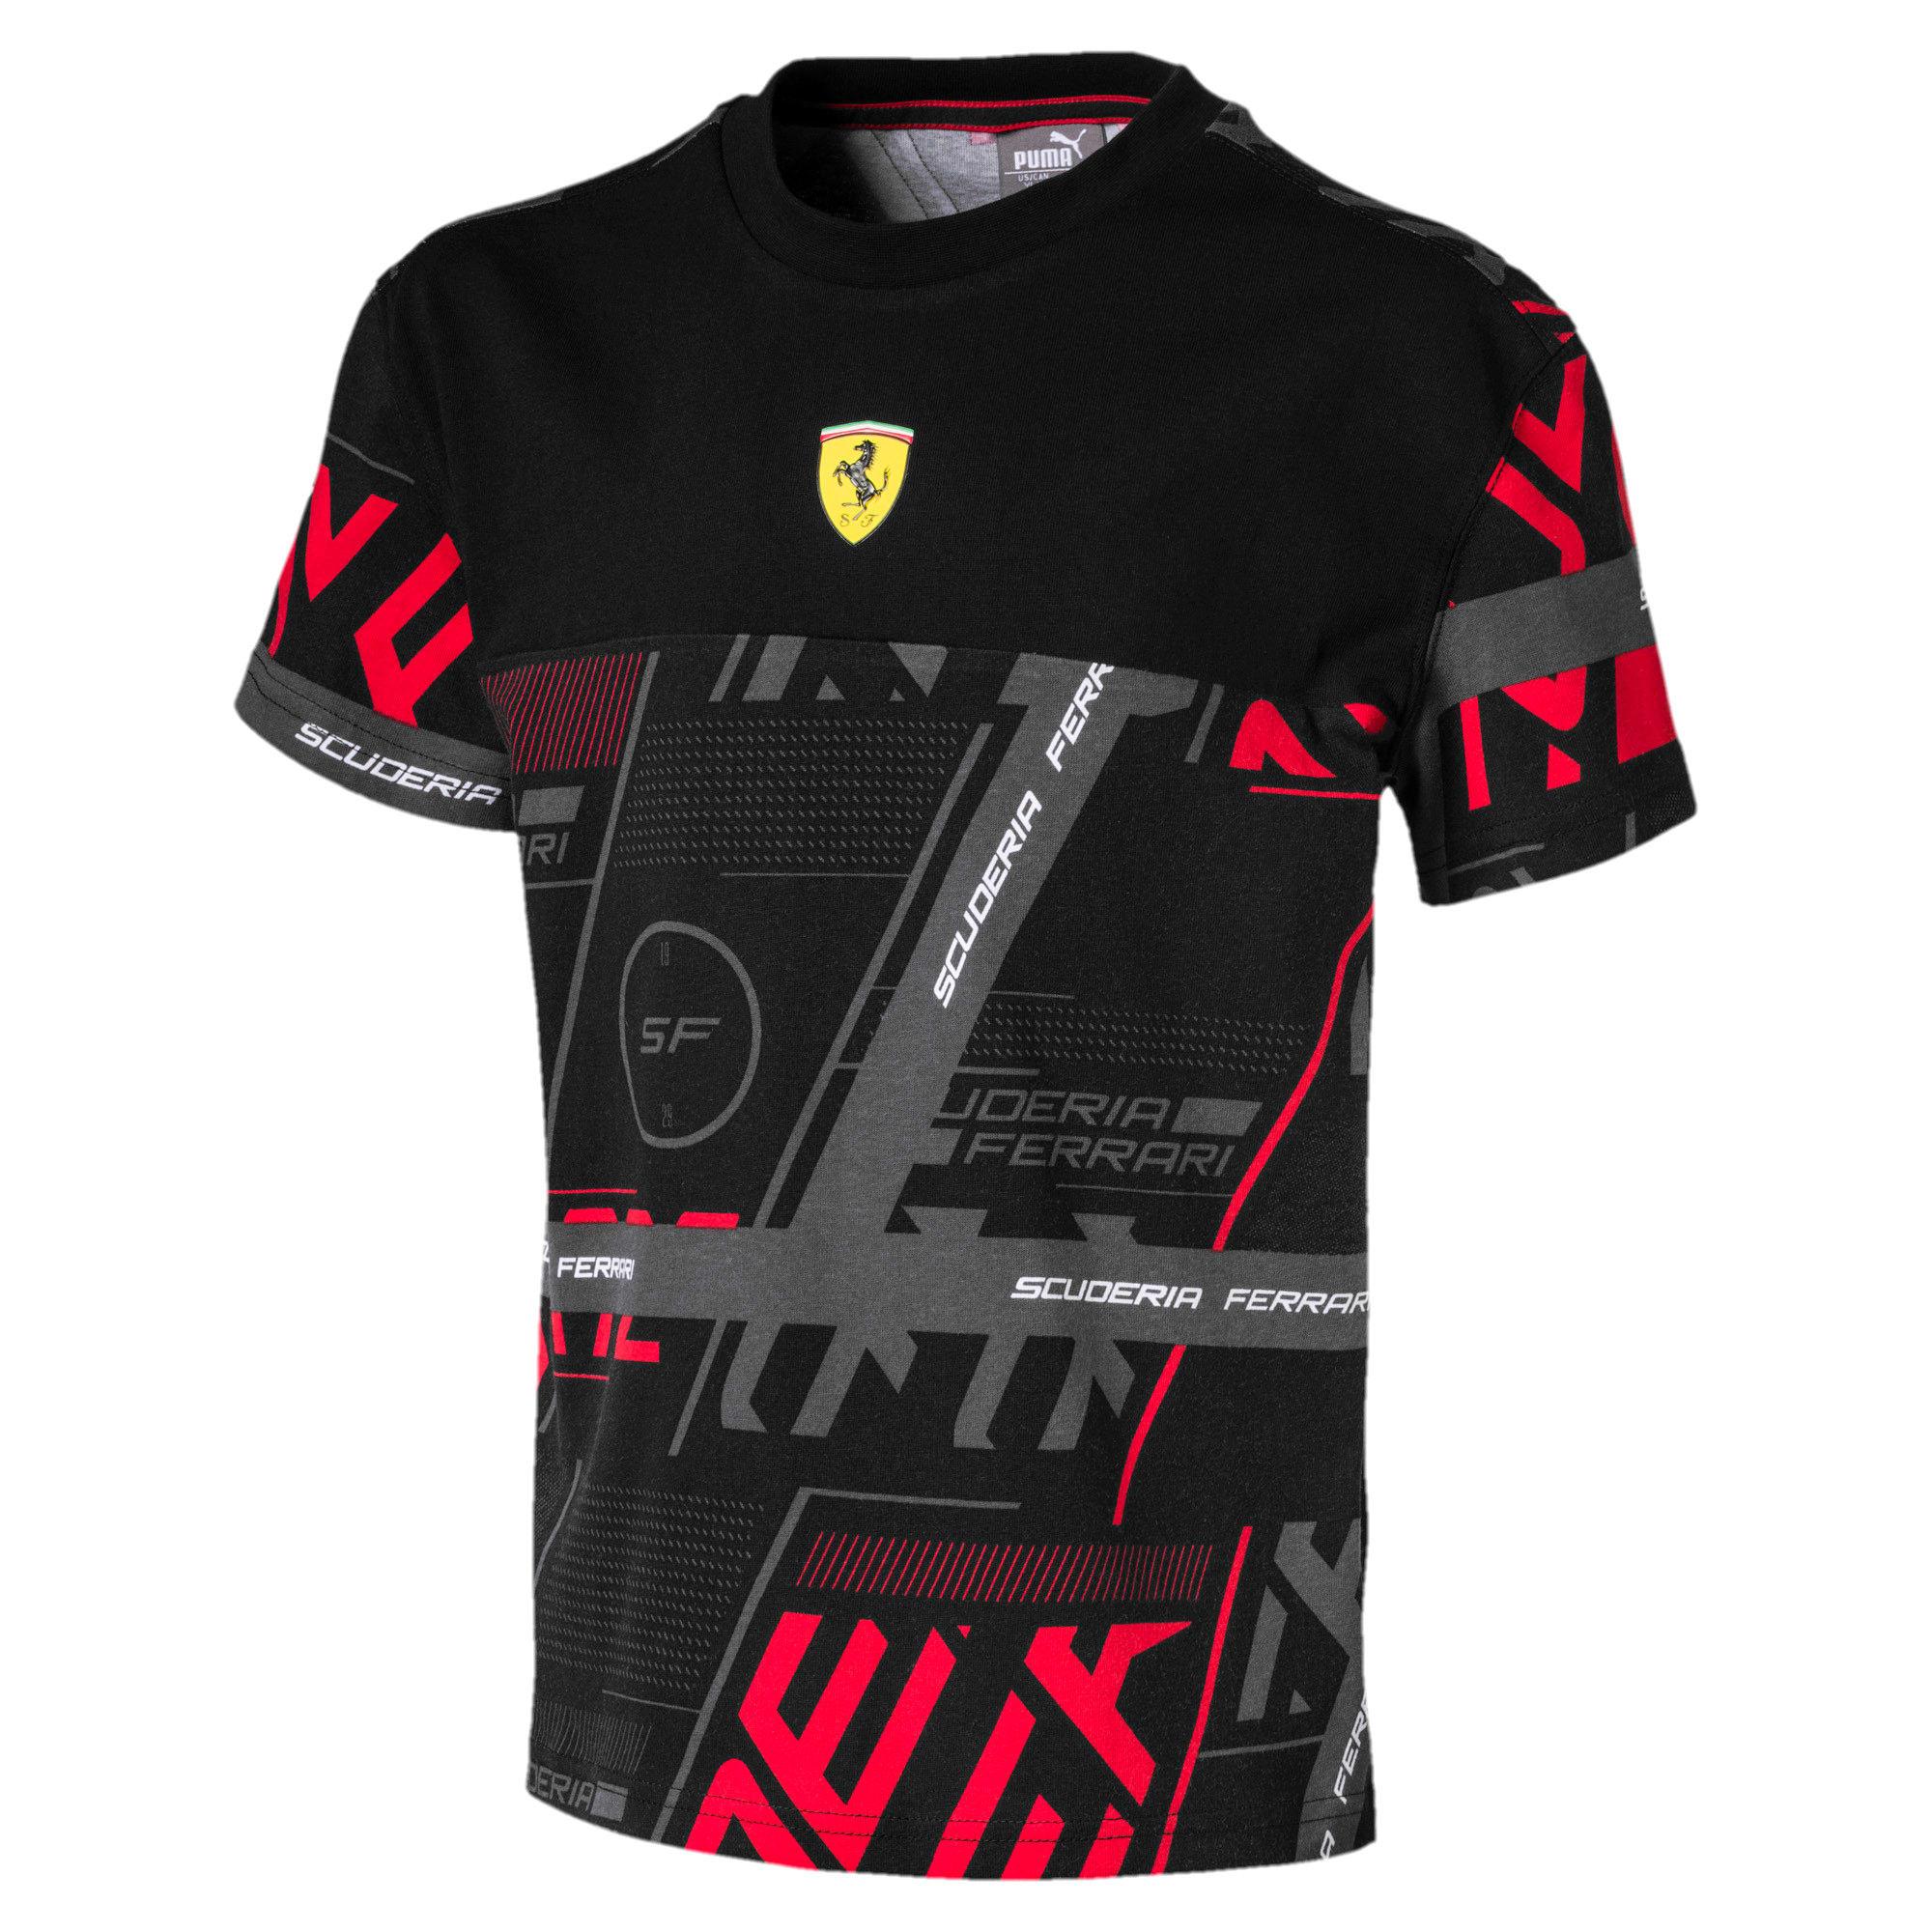 Miniatura 1 de Camiseta urbana Scuderia Ferrari para niño joven, Puma Black, mediano